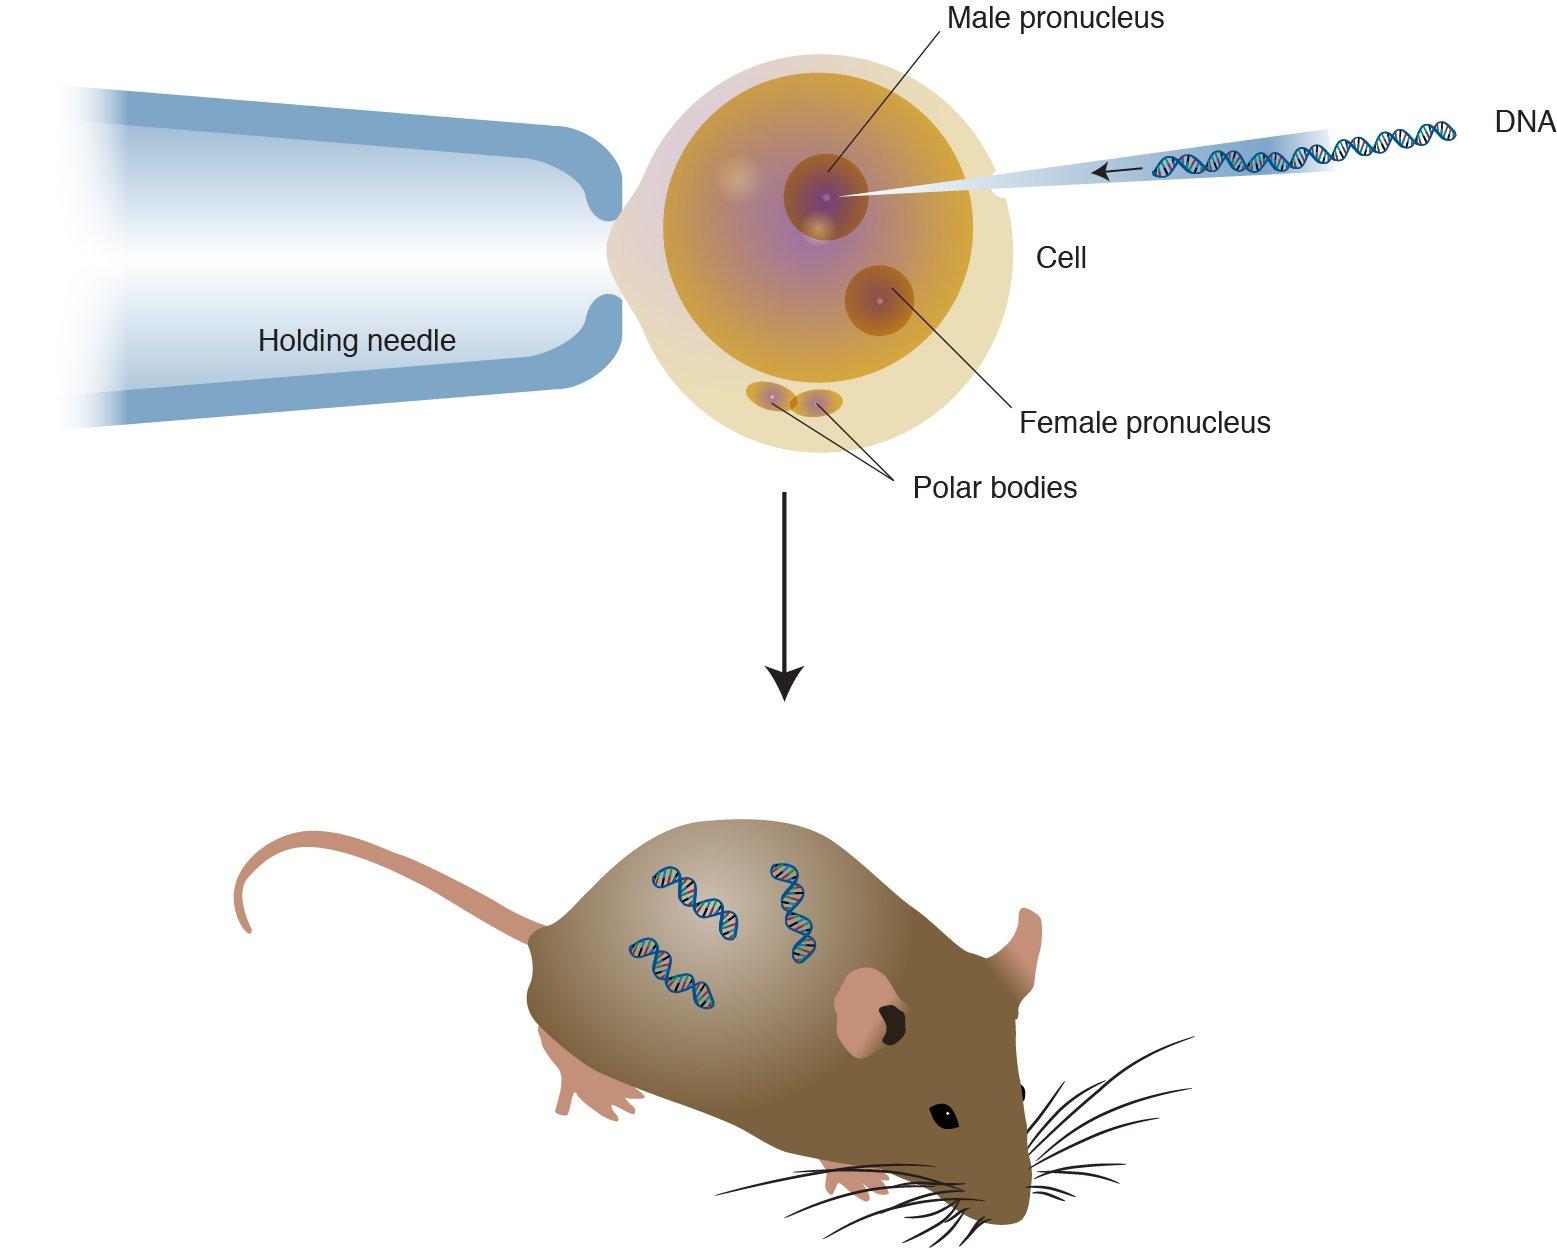 hight resolution of transgenic organisms image